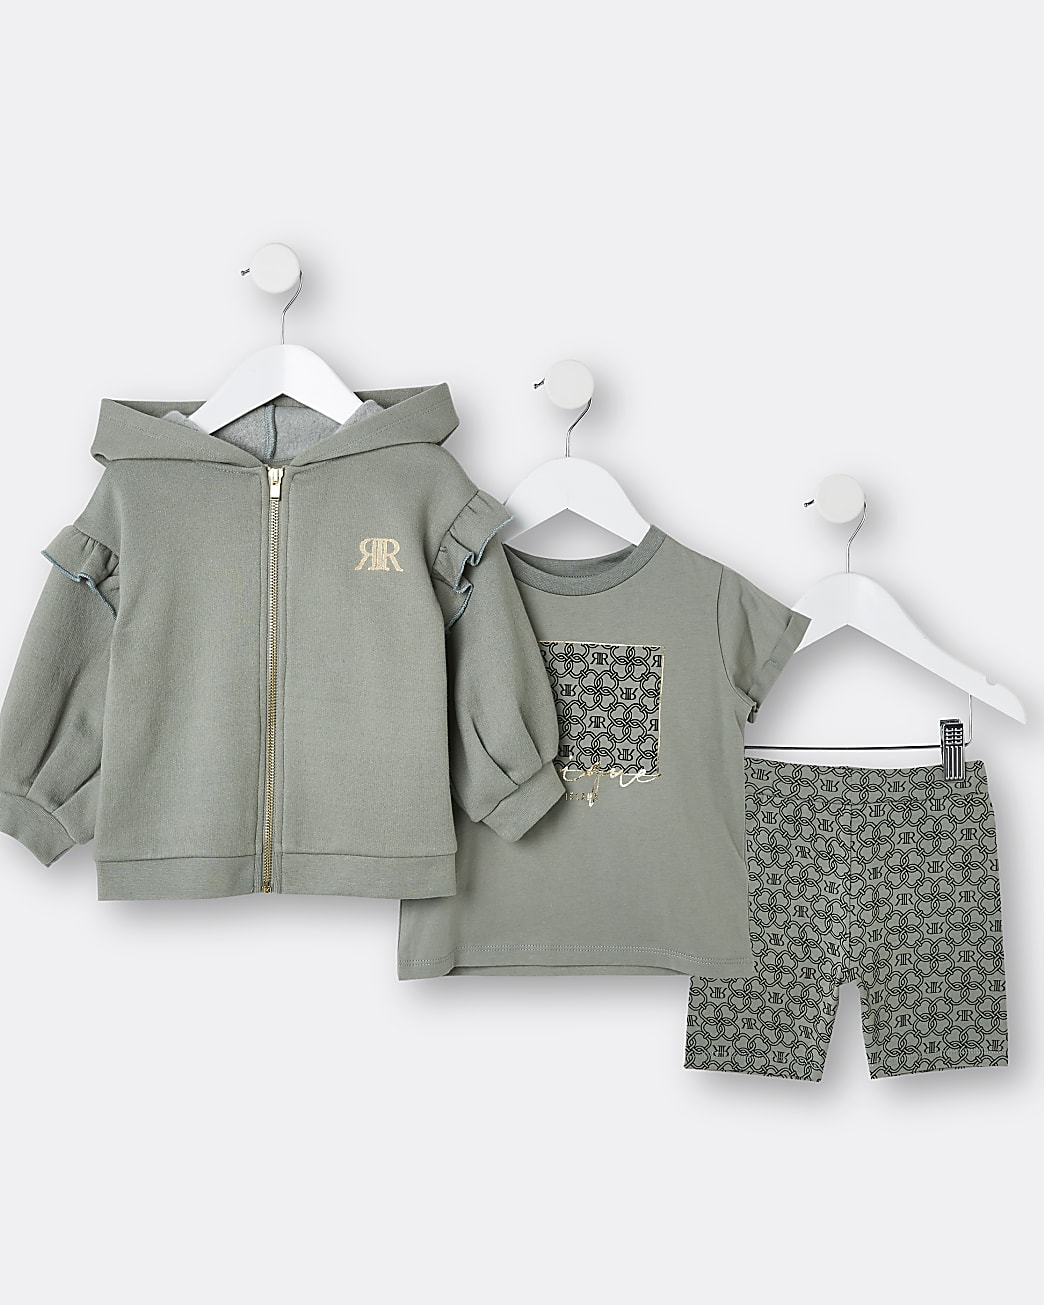 Mini girls khaki 'Unique' RI 3 piece outfit